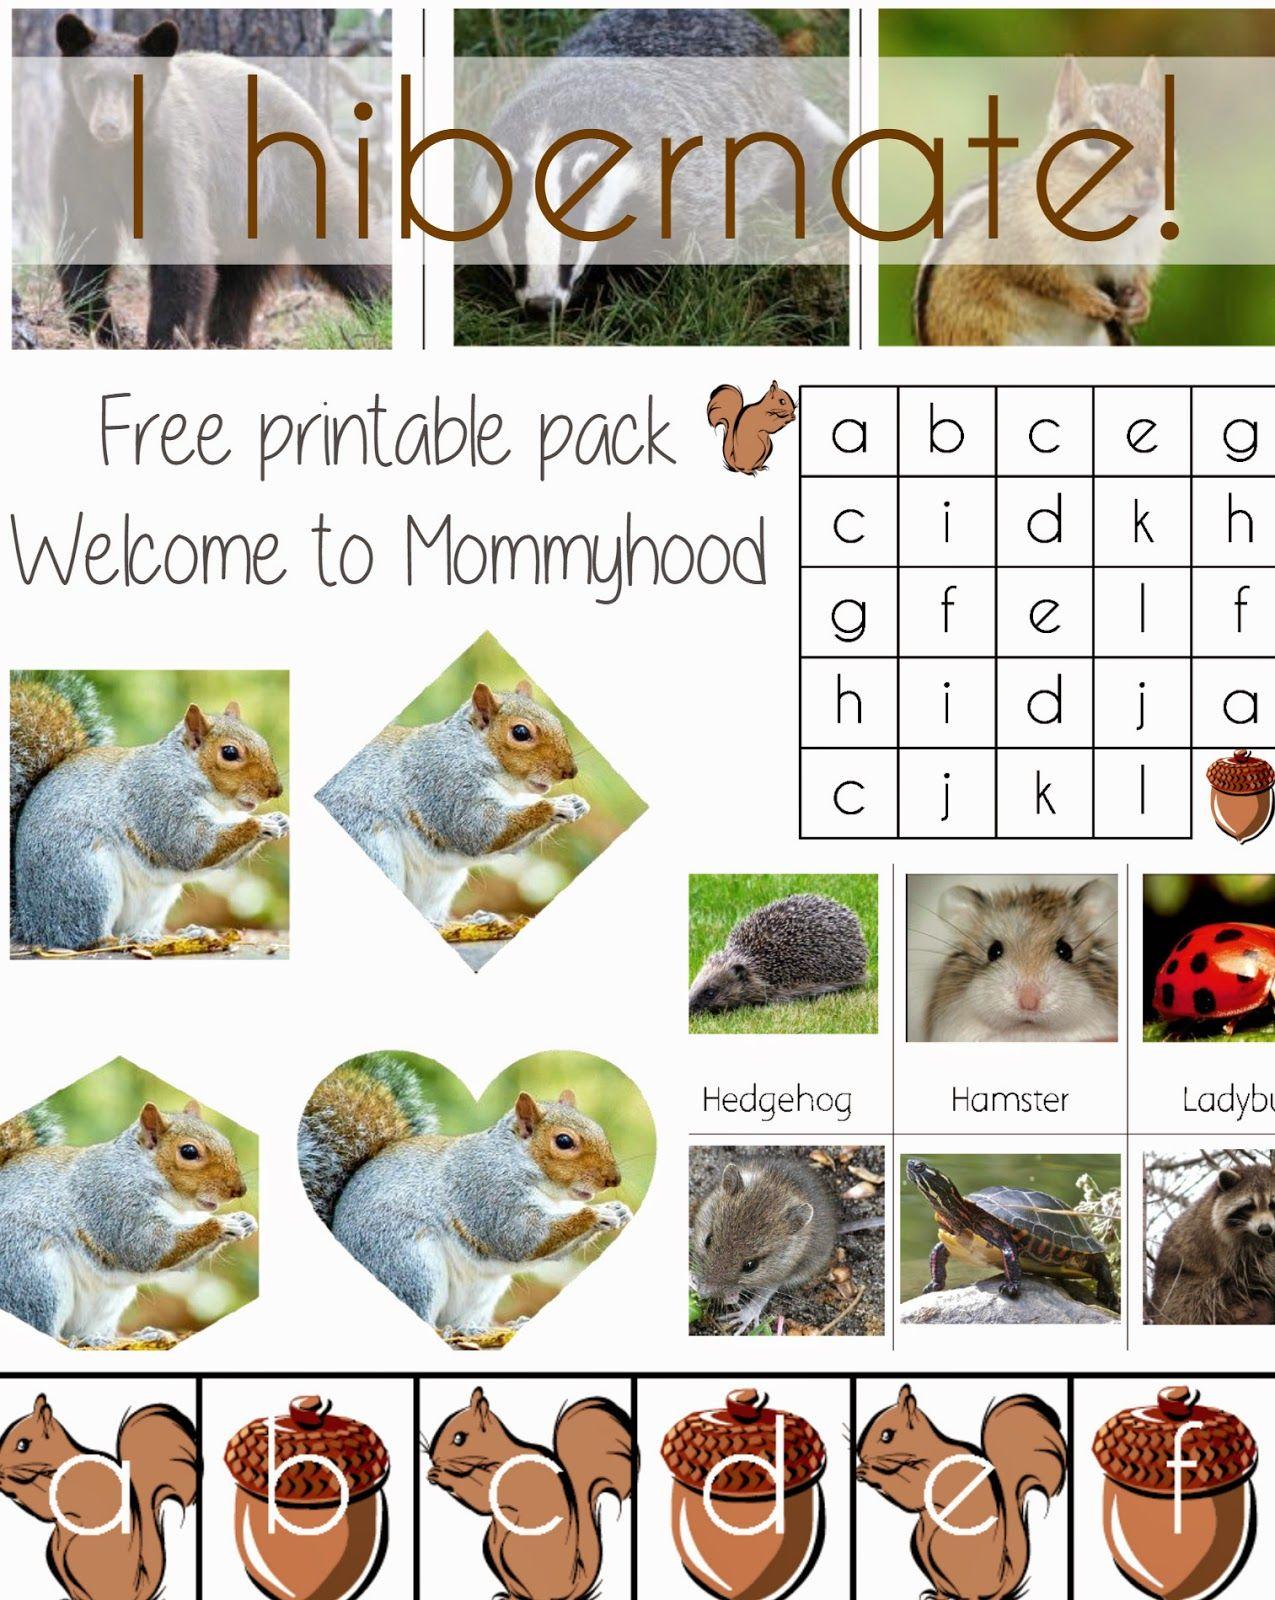 Science Activities For Preschoolers And Toddlers: Hibernation - Free Printable Hibernation Worksheets